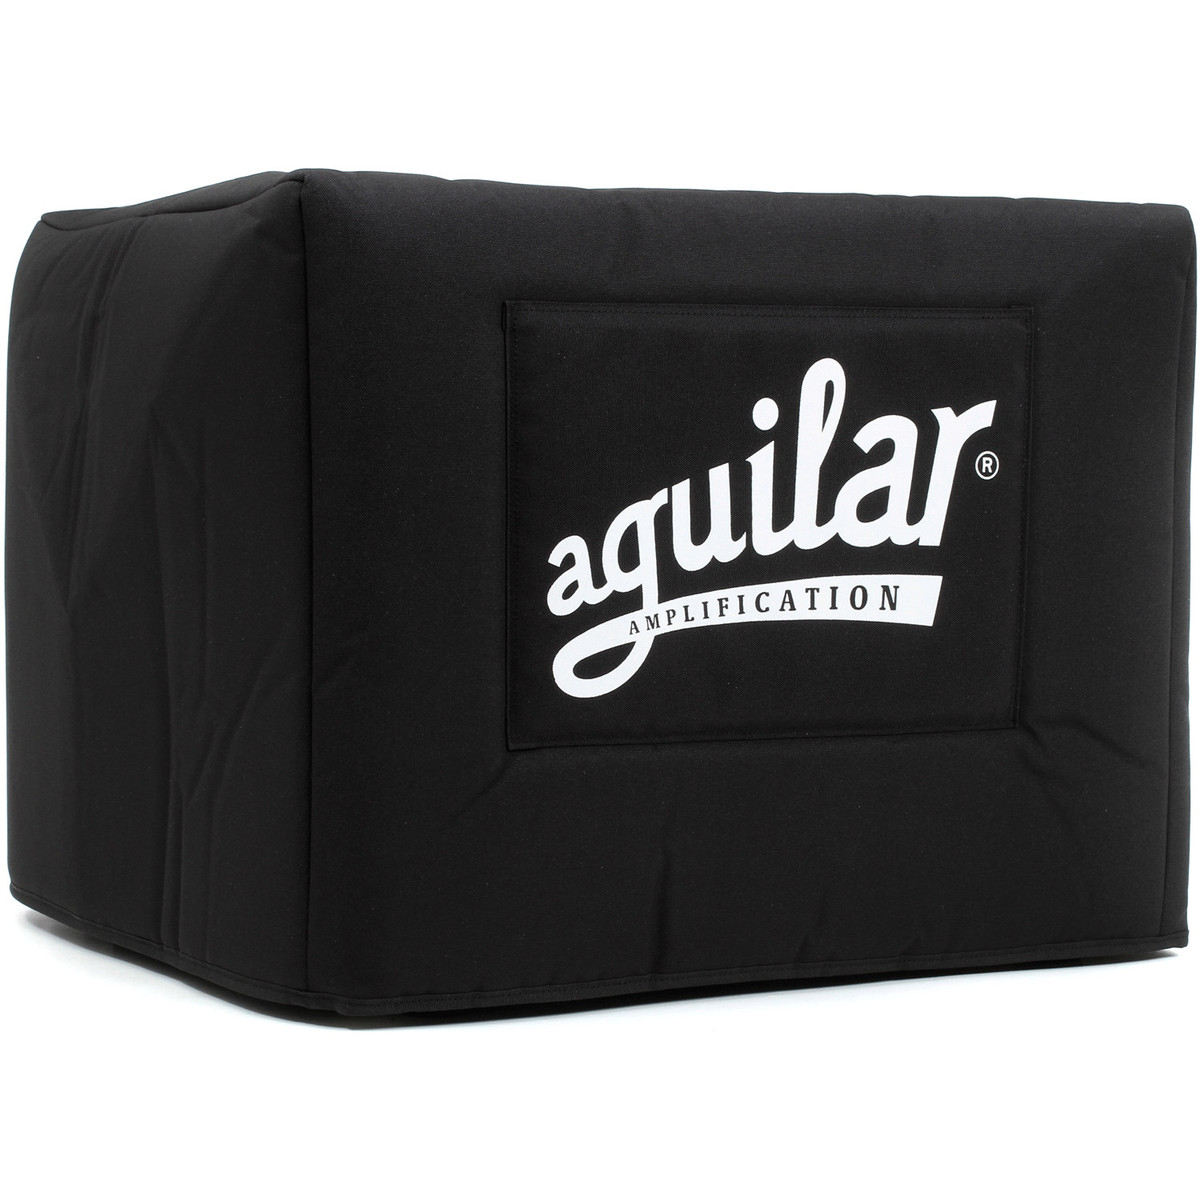 aguilar cabinet cover for sl 112 at gear4music. Black Bedroom Furniture Sets. Home Design Ideas